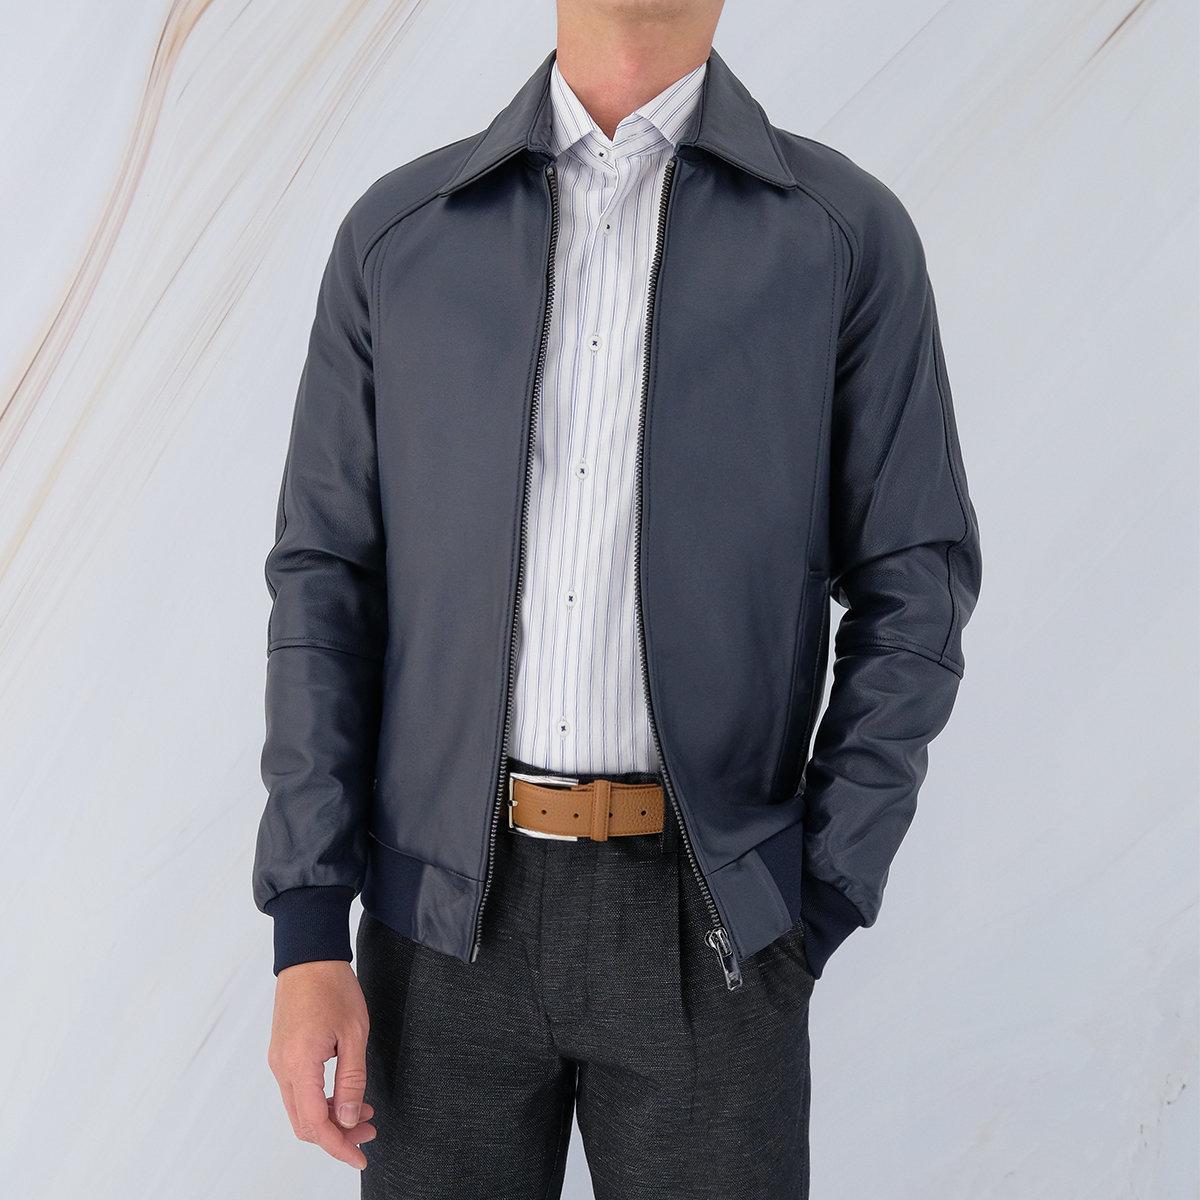 Men's Lamb Nappa Jacket with Detechable Collar (Peacoat)